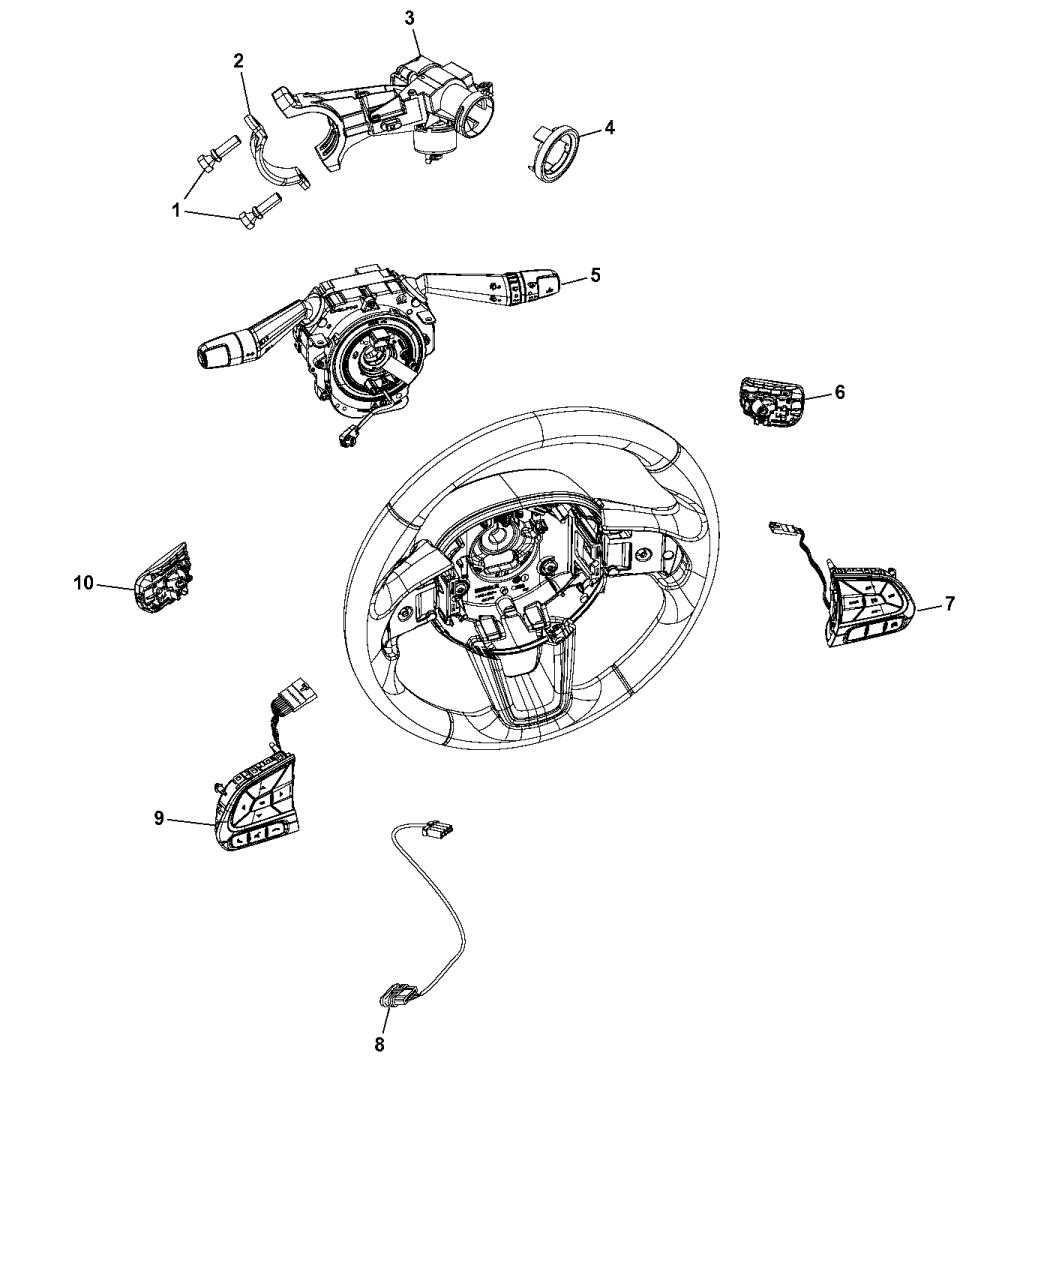 Mopar 68275033AA on ford steering column wiring diagram, chevy truck steering column wiring diagram, steering wheel column wiring diagram, camaro steering column wiring diagram, dodge steering column wiring diagram, jeep steering column repair diagram, oldsmobile steering column wiring diagram, gm tilt steering column wiring diagram, chevrolet turn signal wiring diagram, buick steering column wiring diagram, general motors steering column wiring diagram,